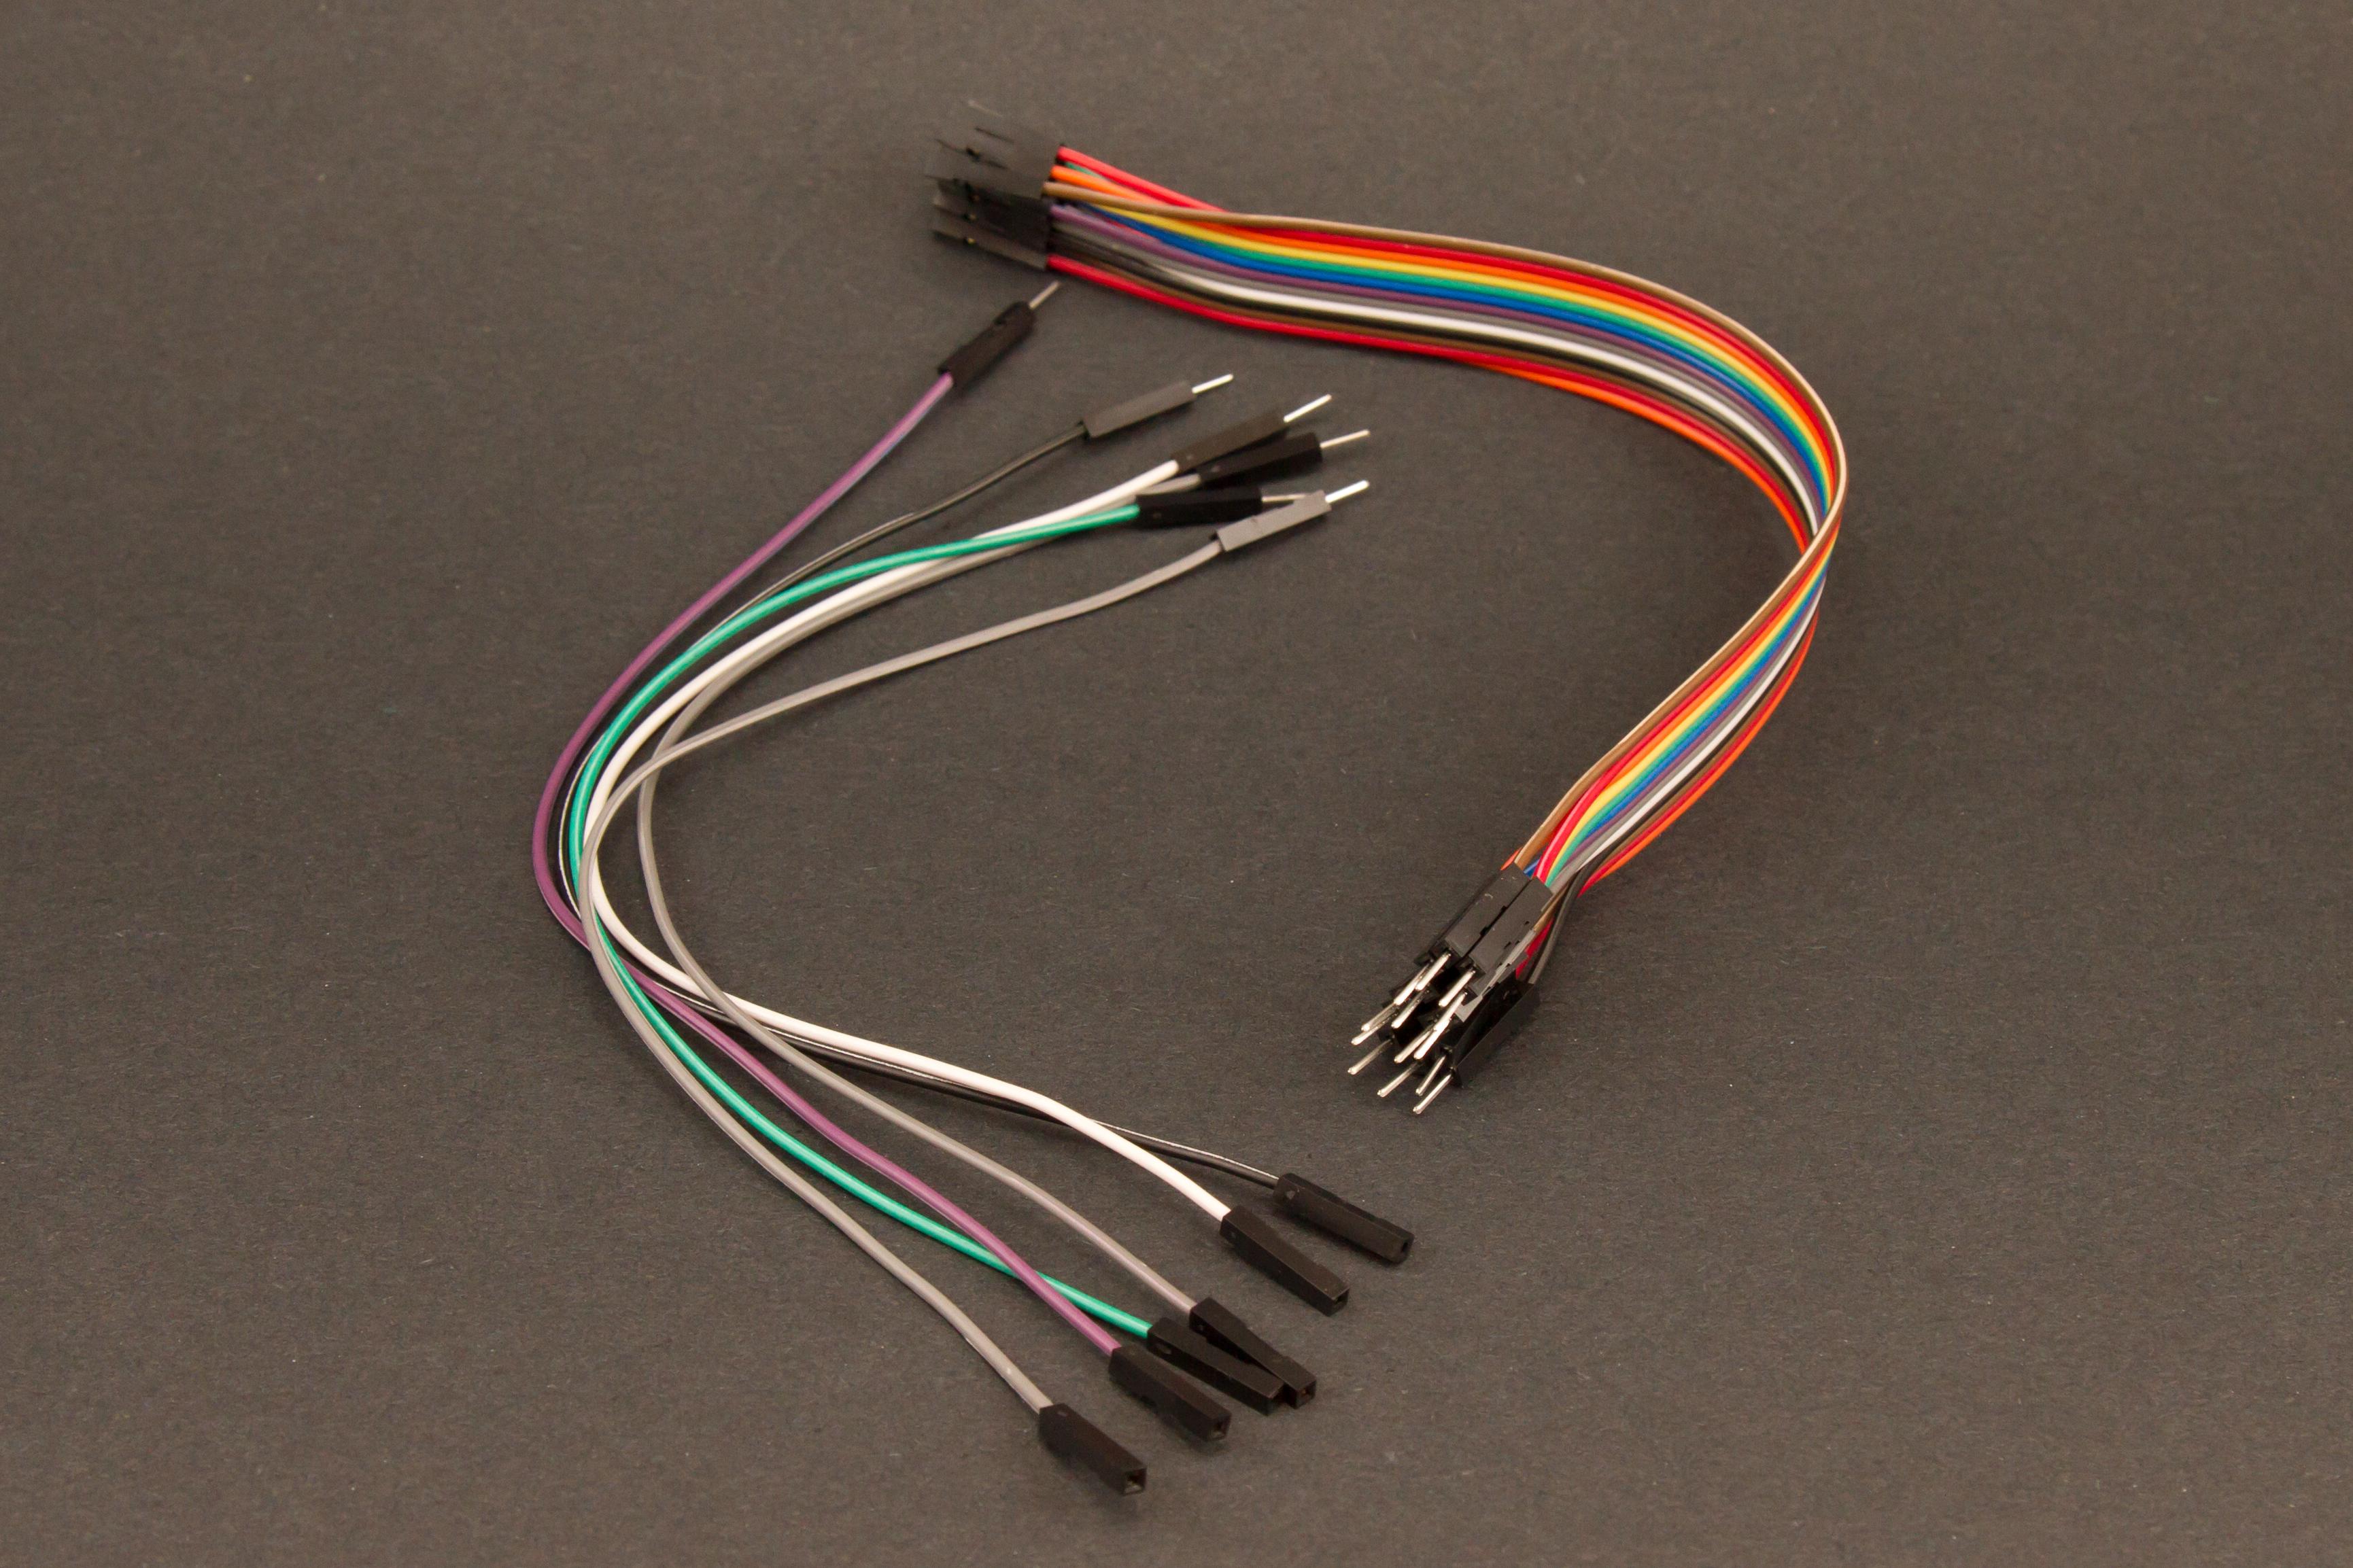 circuitpython_IMG_0092.jpg